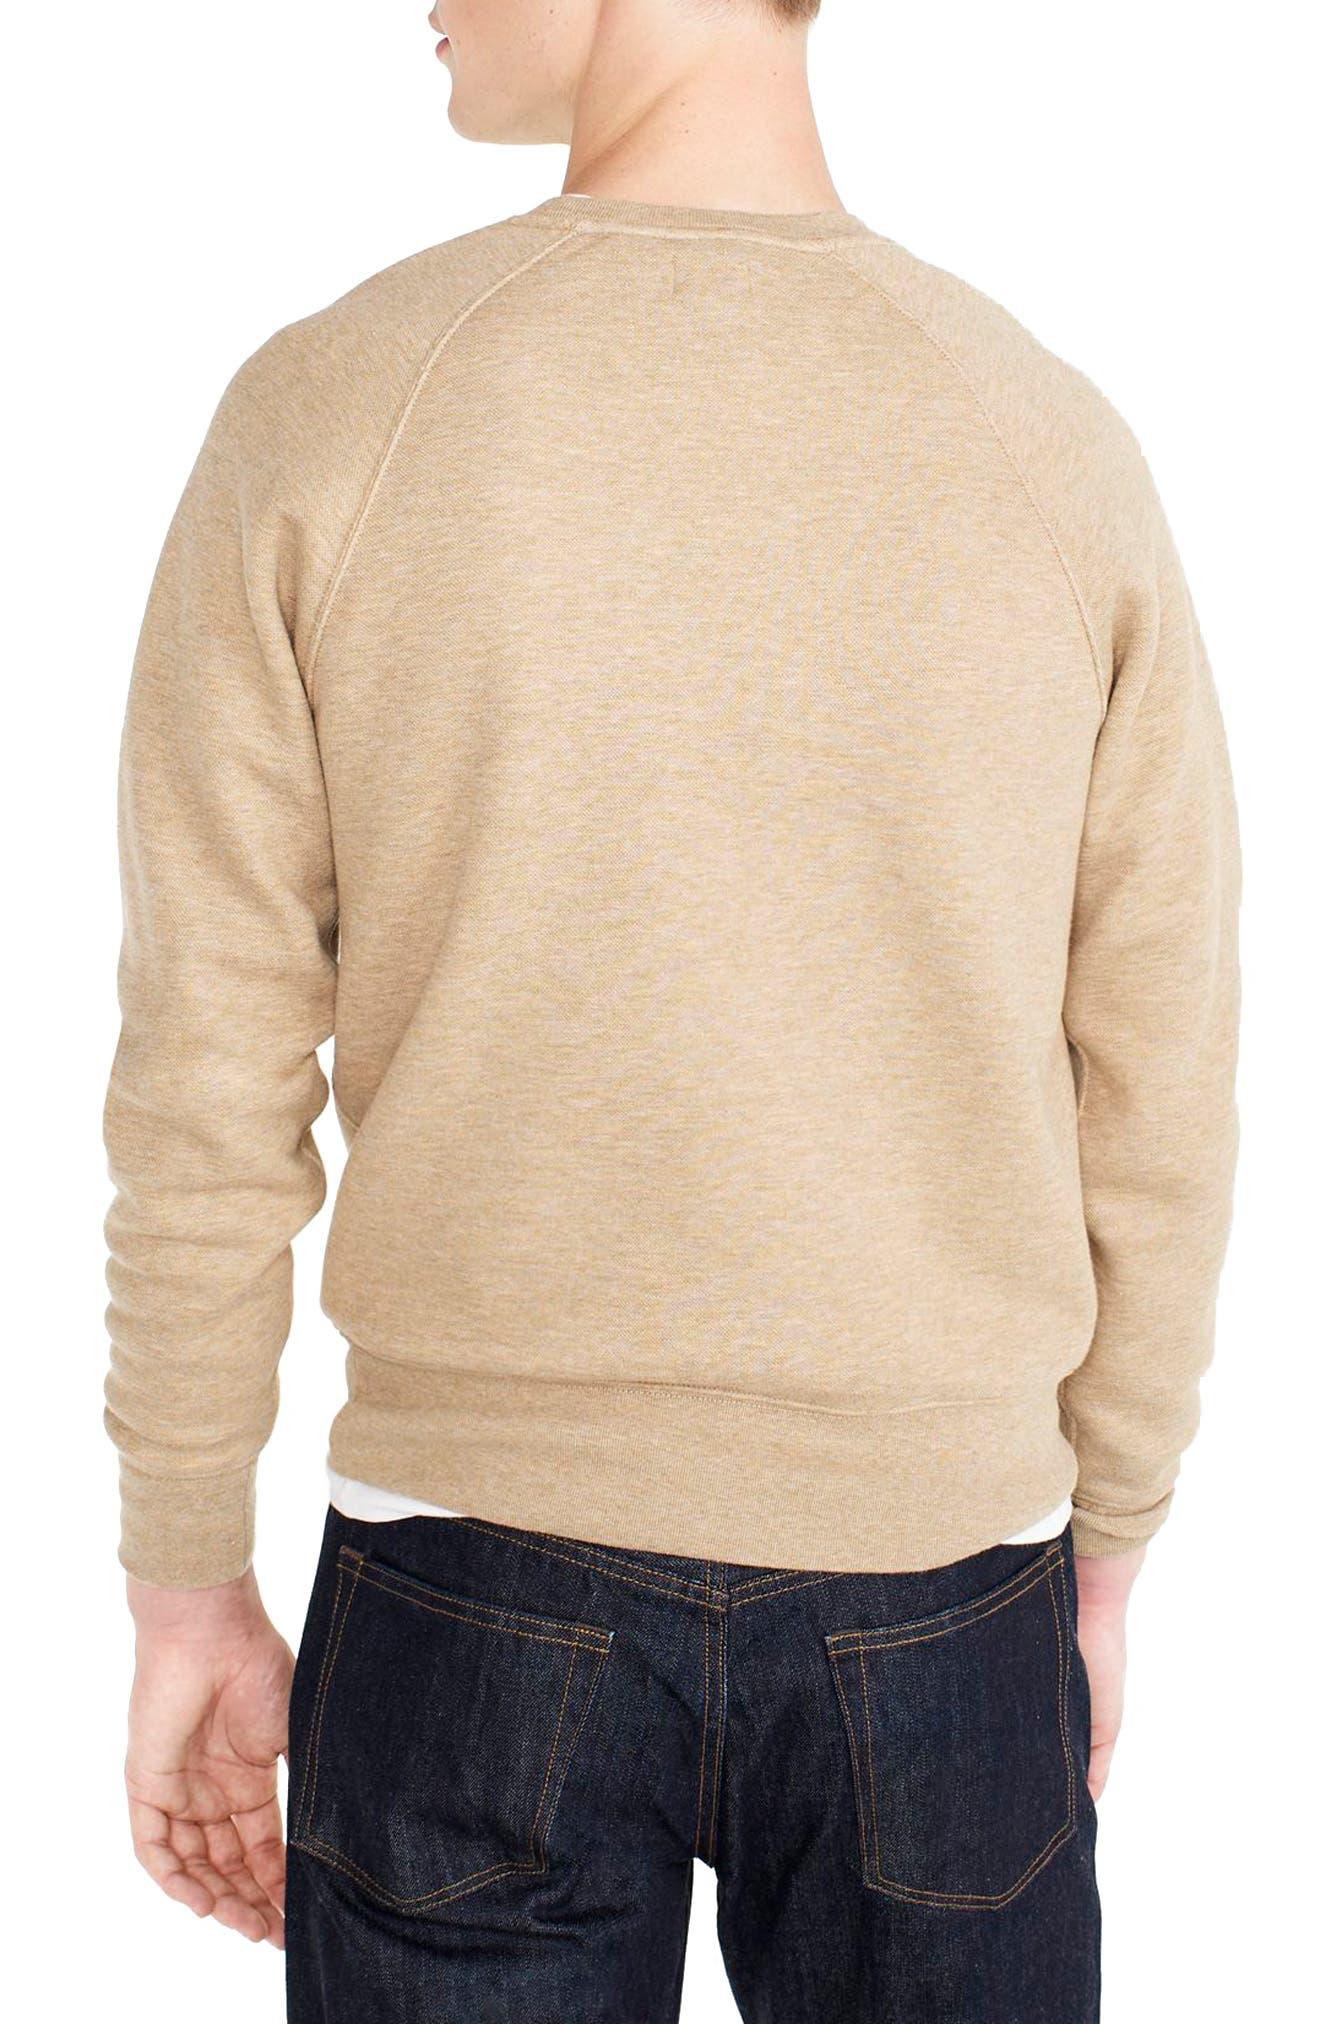 Textured Piqué Fleece Sweatshirt,                             Alternate thumbnail 2, color,                             Heather Nut